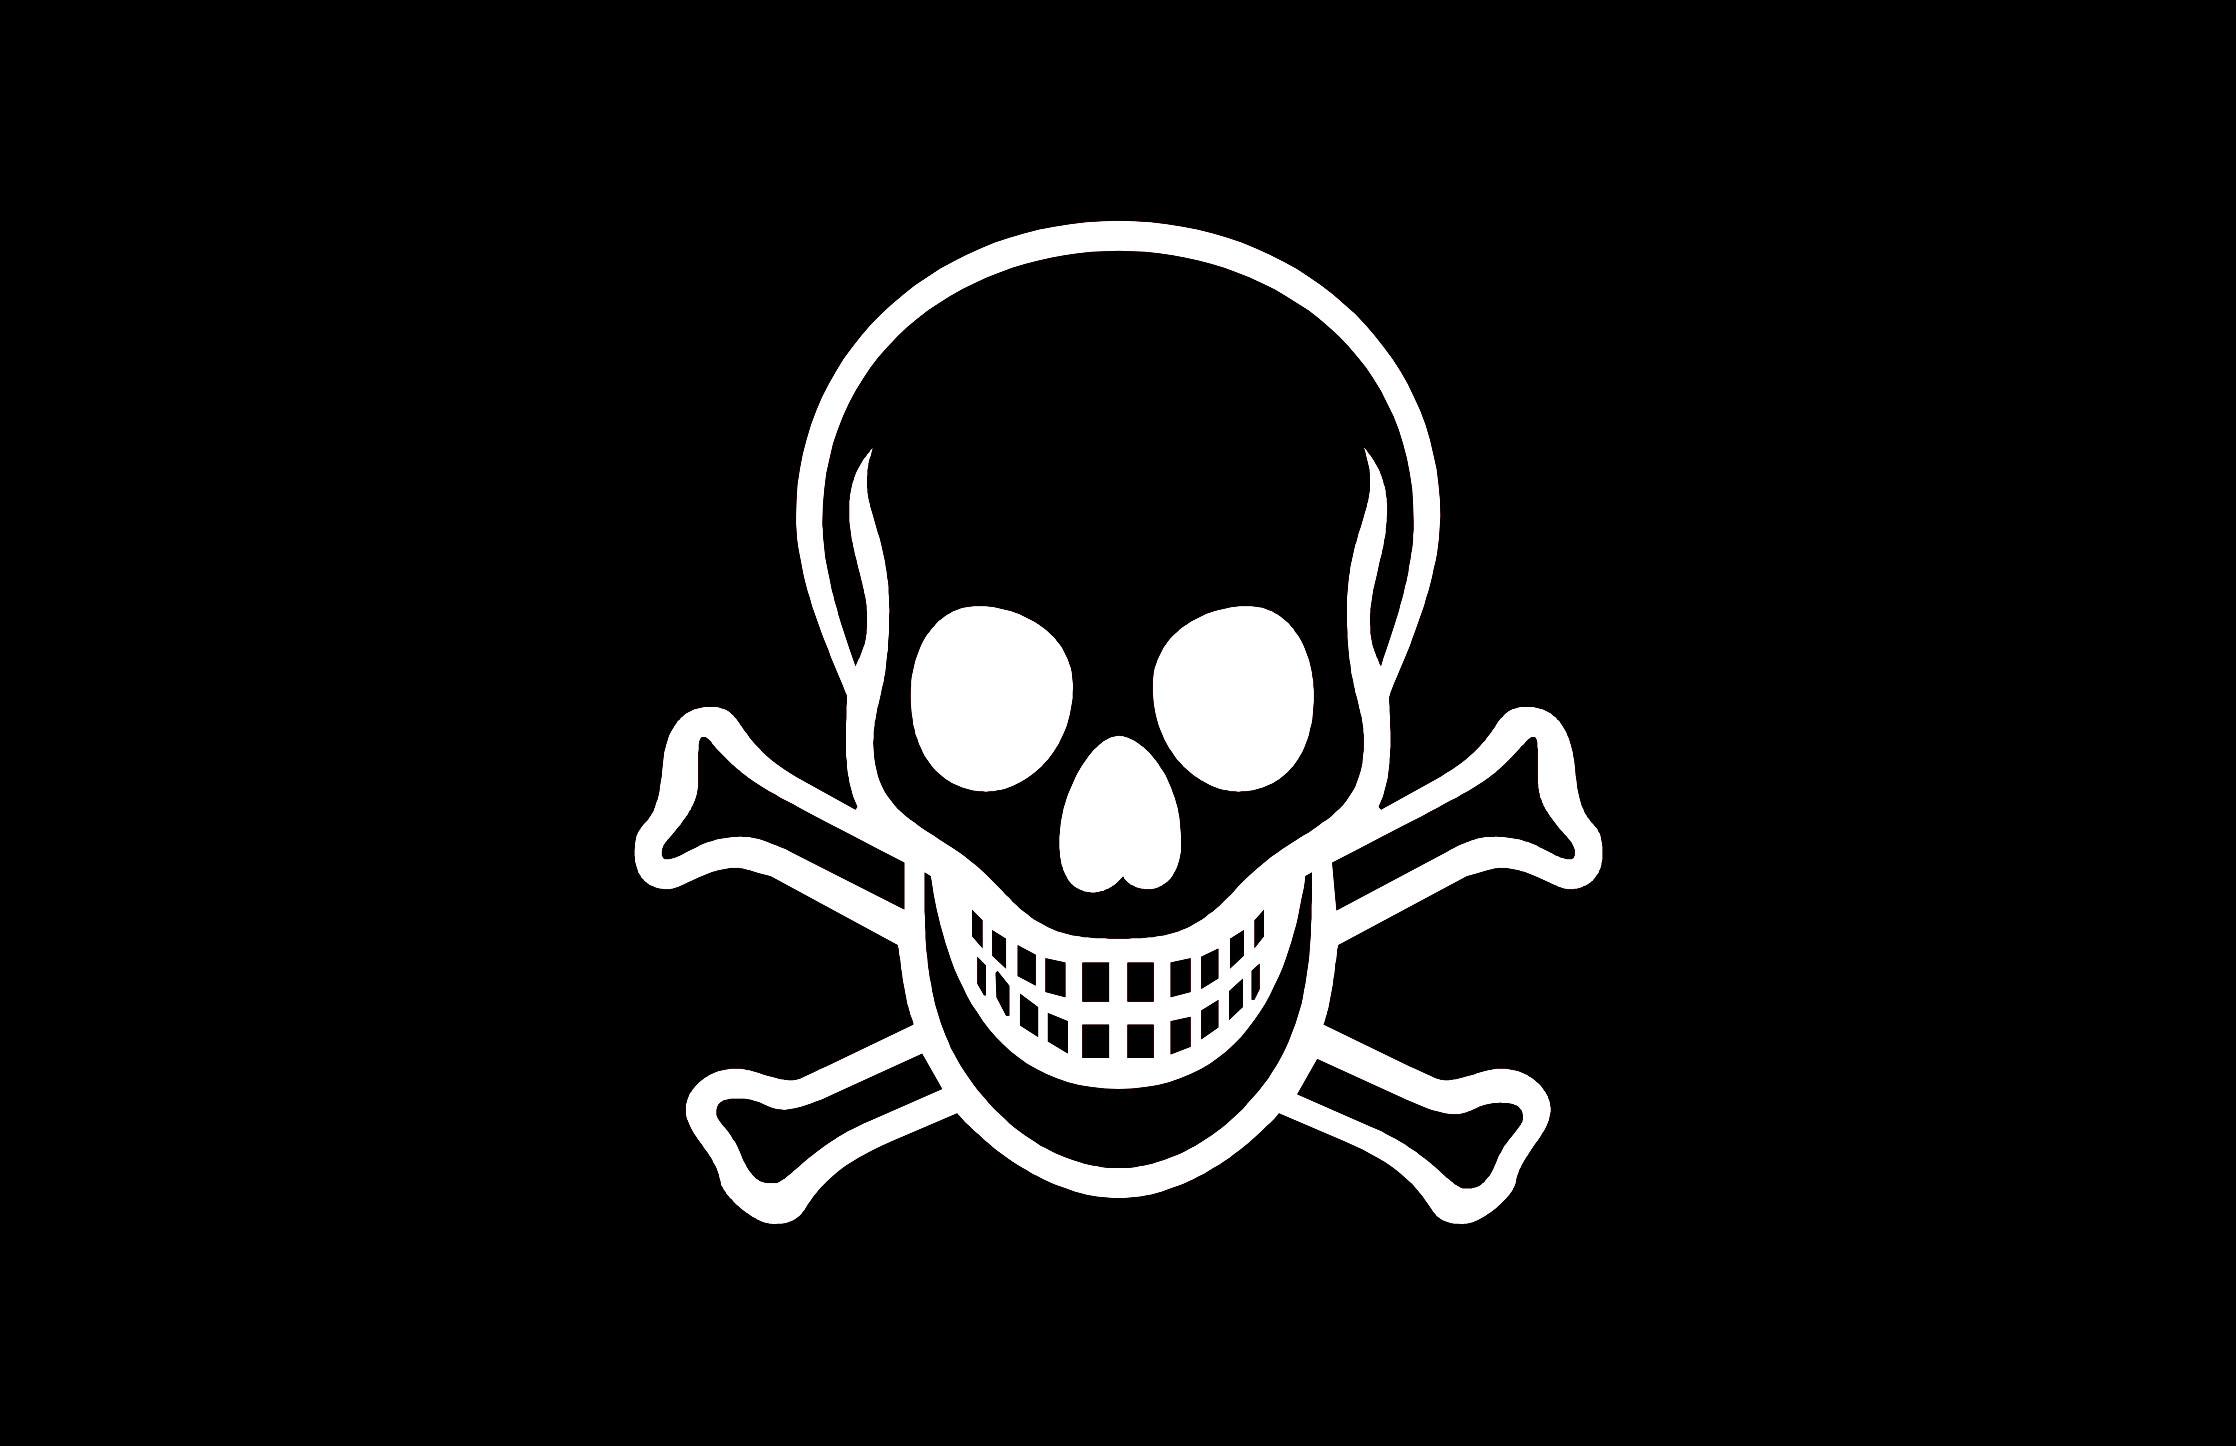 piratskiy_flag_1.jpg.94979398835cabdb34ff9b6354b74fb9.jpg